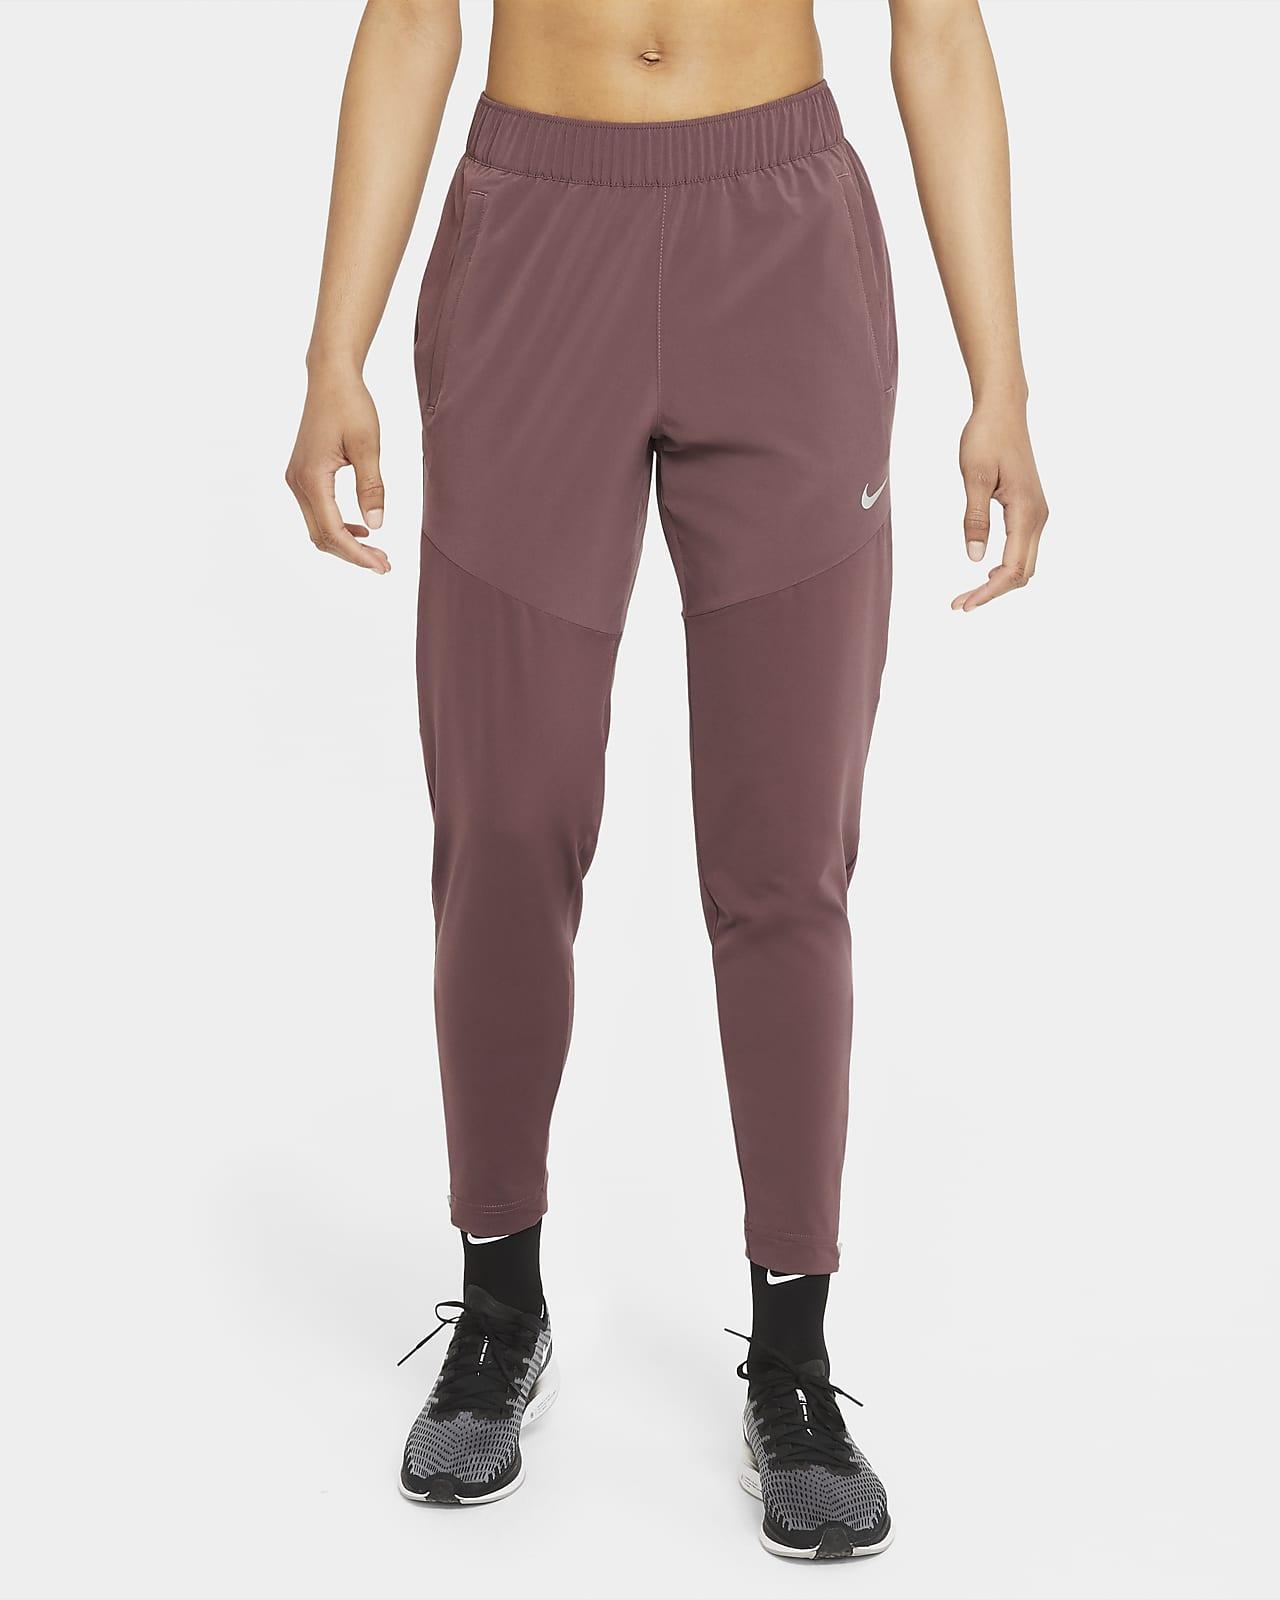 Dámské běžecké kalhoty Nike Dri-FIT Essential